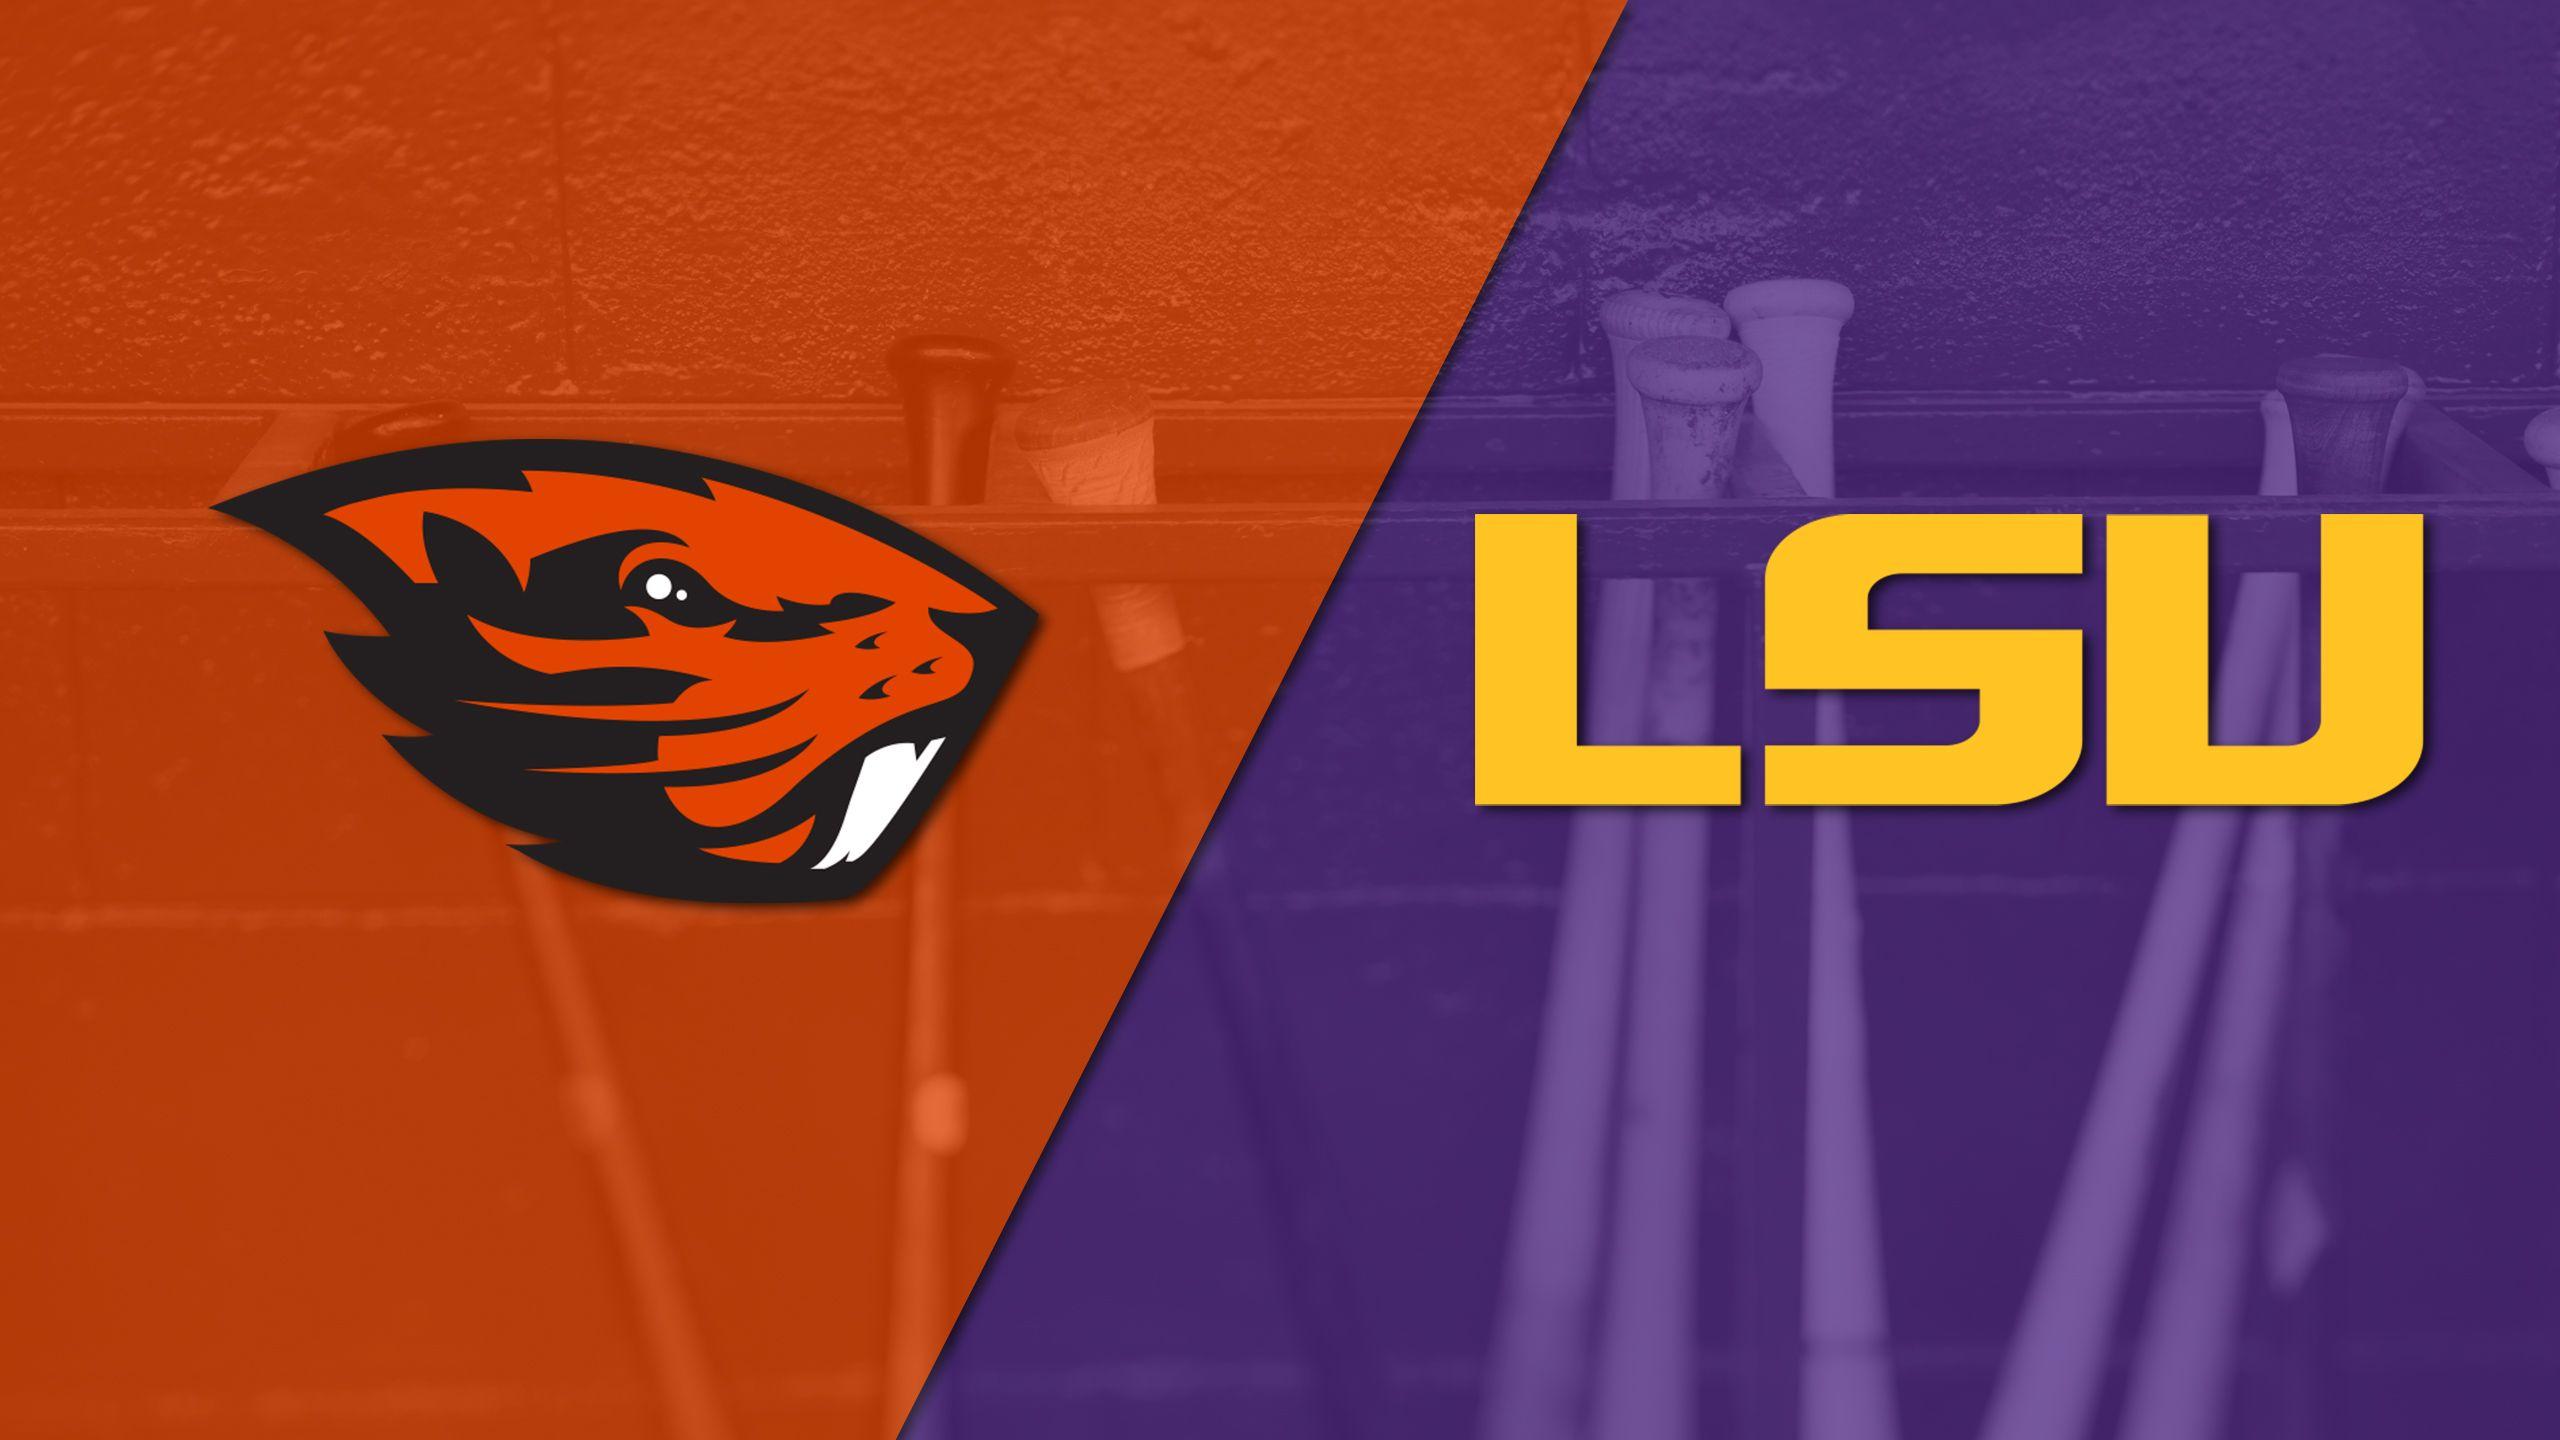 Multiview - #1 Oregon State vs. #4 LSU (Game 6) (College World Series)